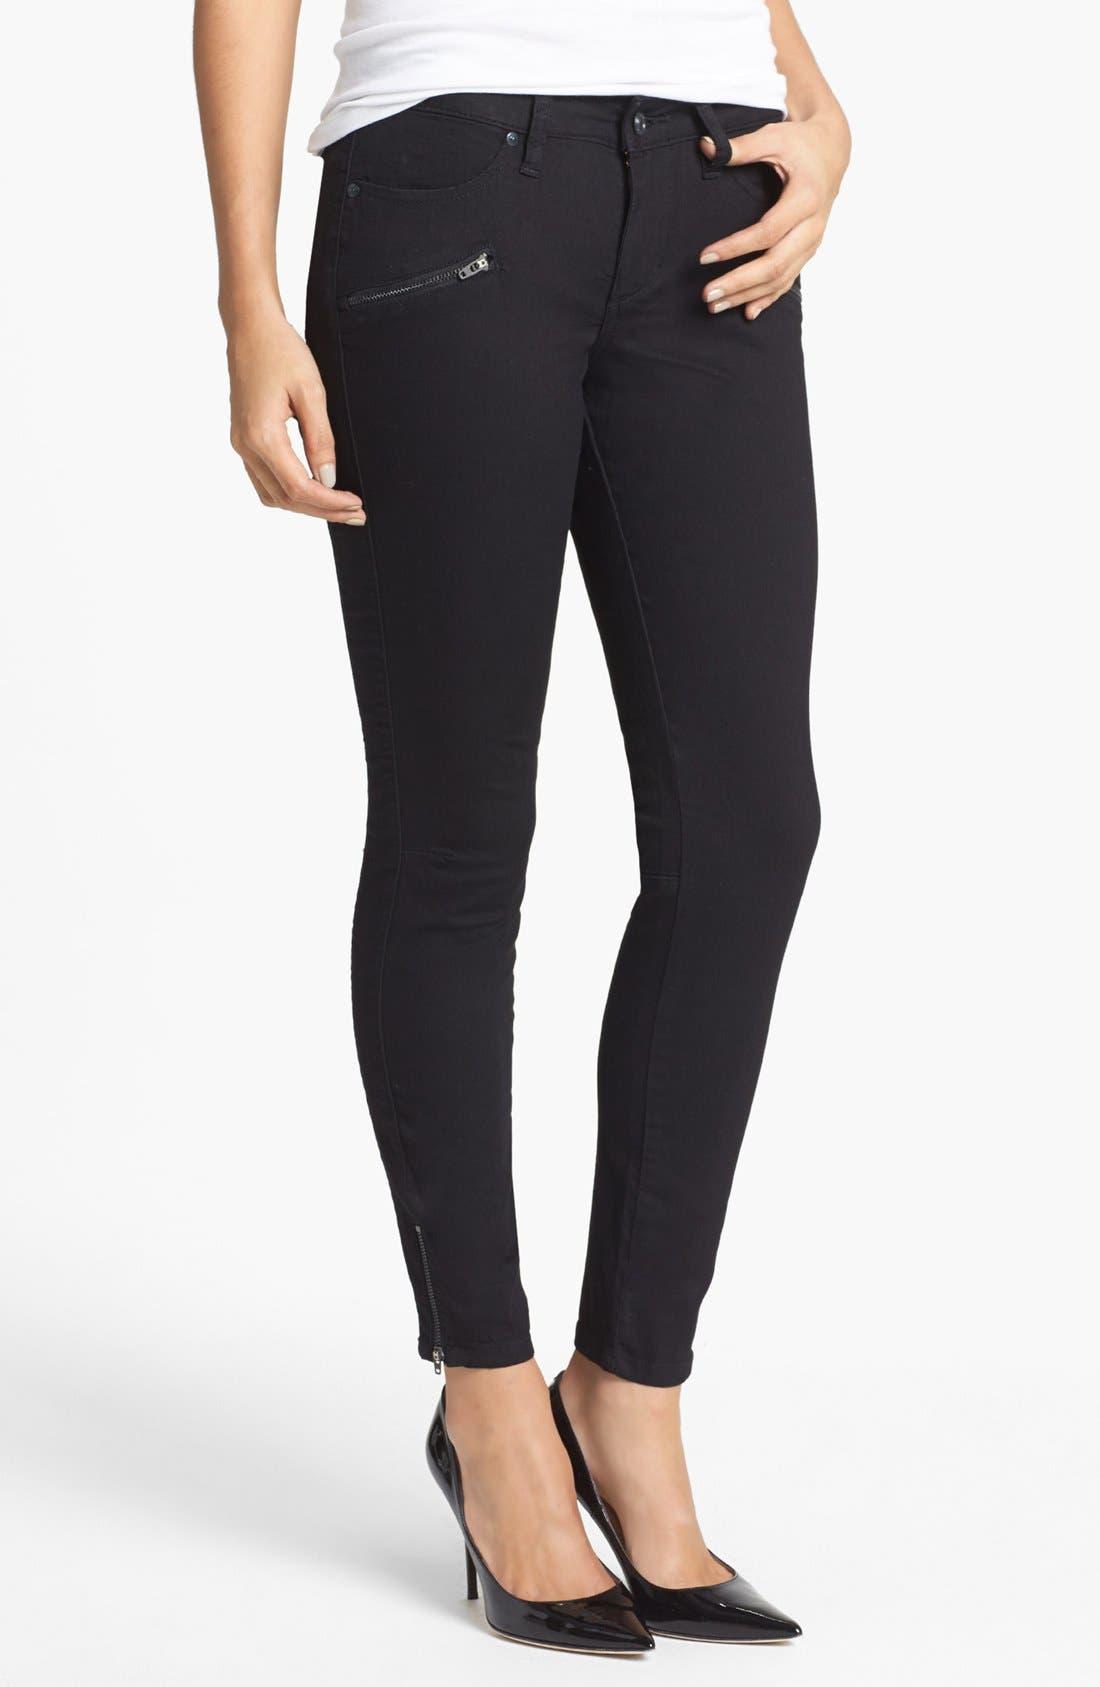 Alternate Image 1 Selected - Jag Jeans 'Bren' Zip Detail Skinny Jeans